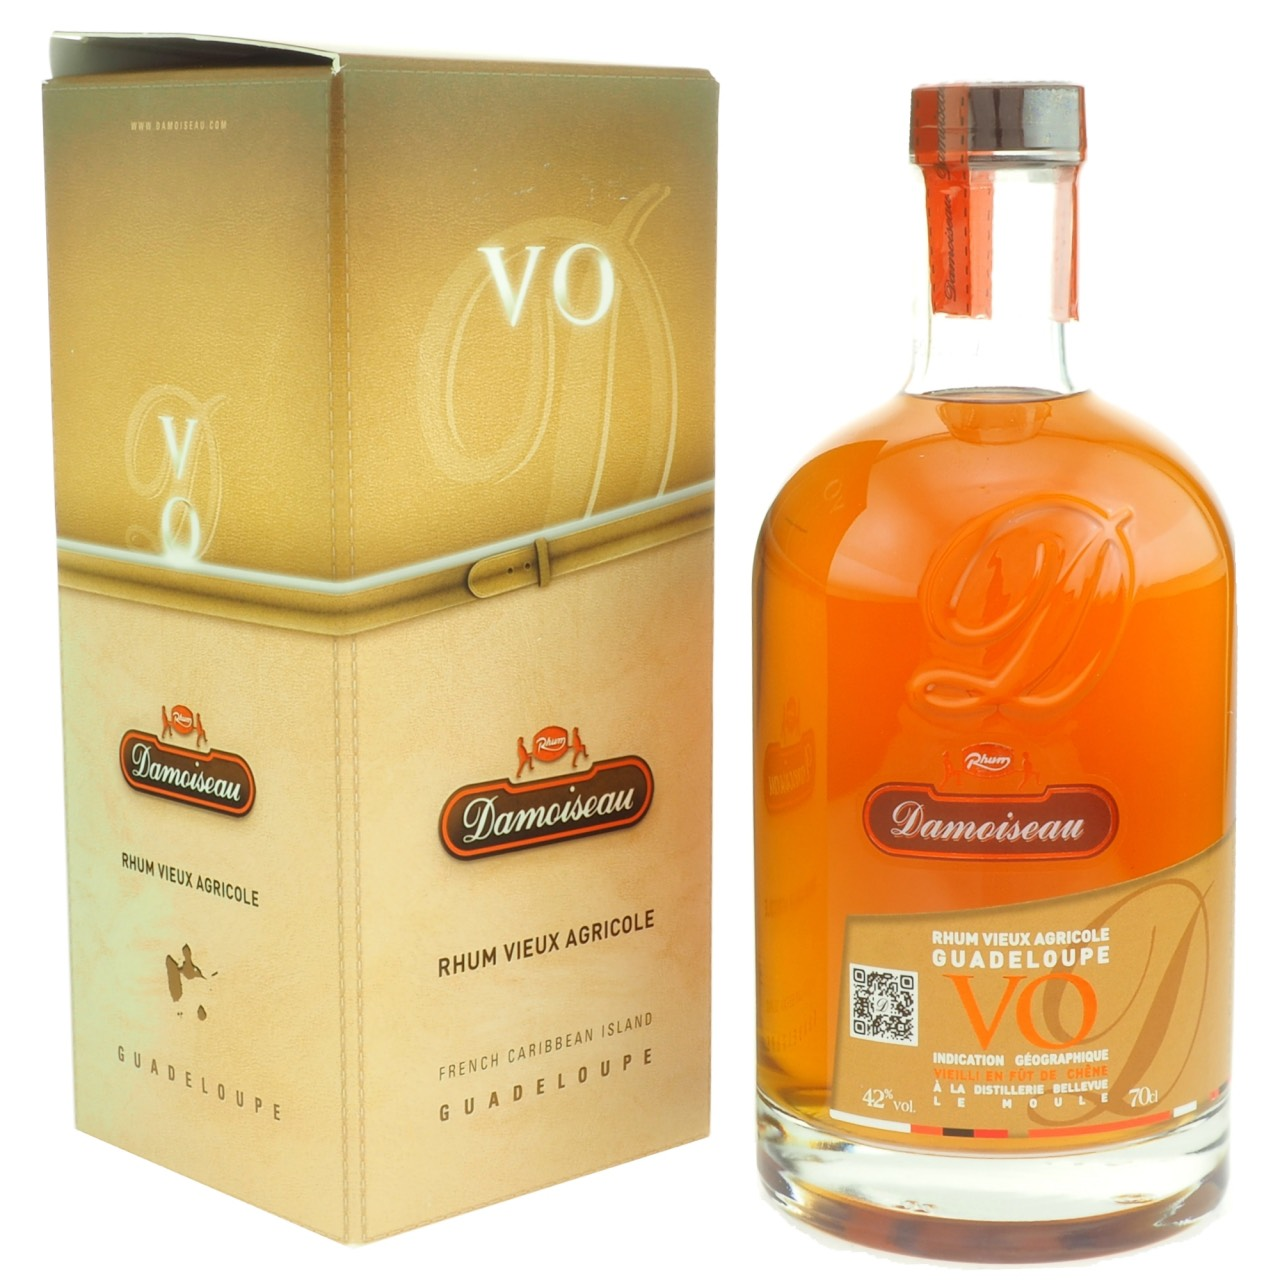 Bottle image of VO